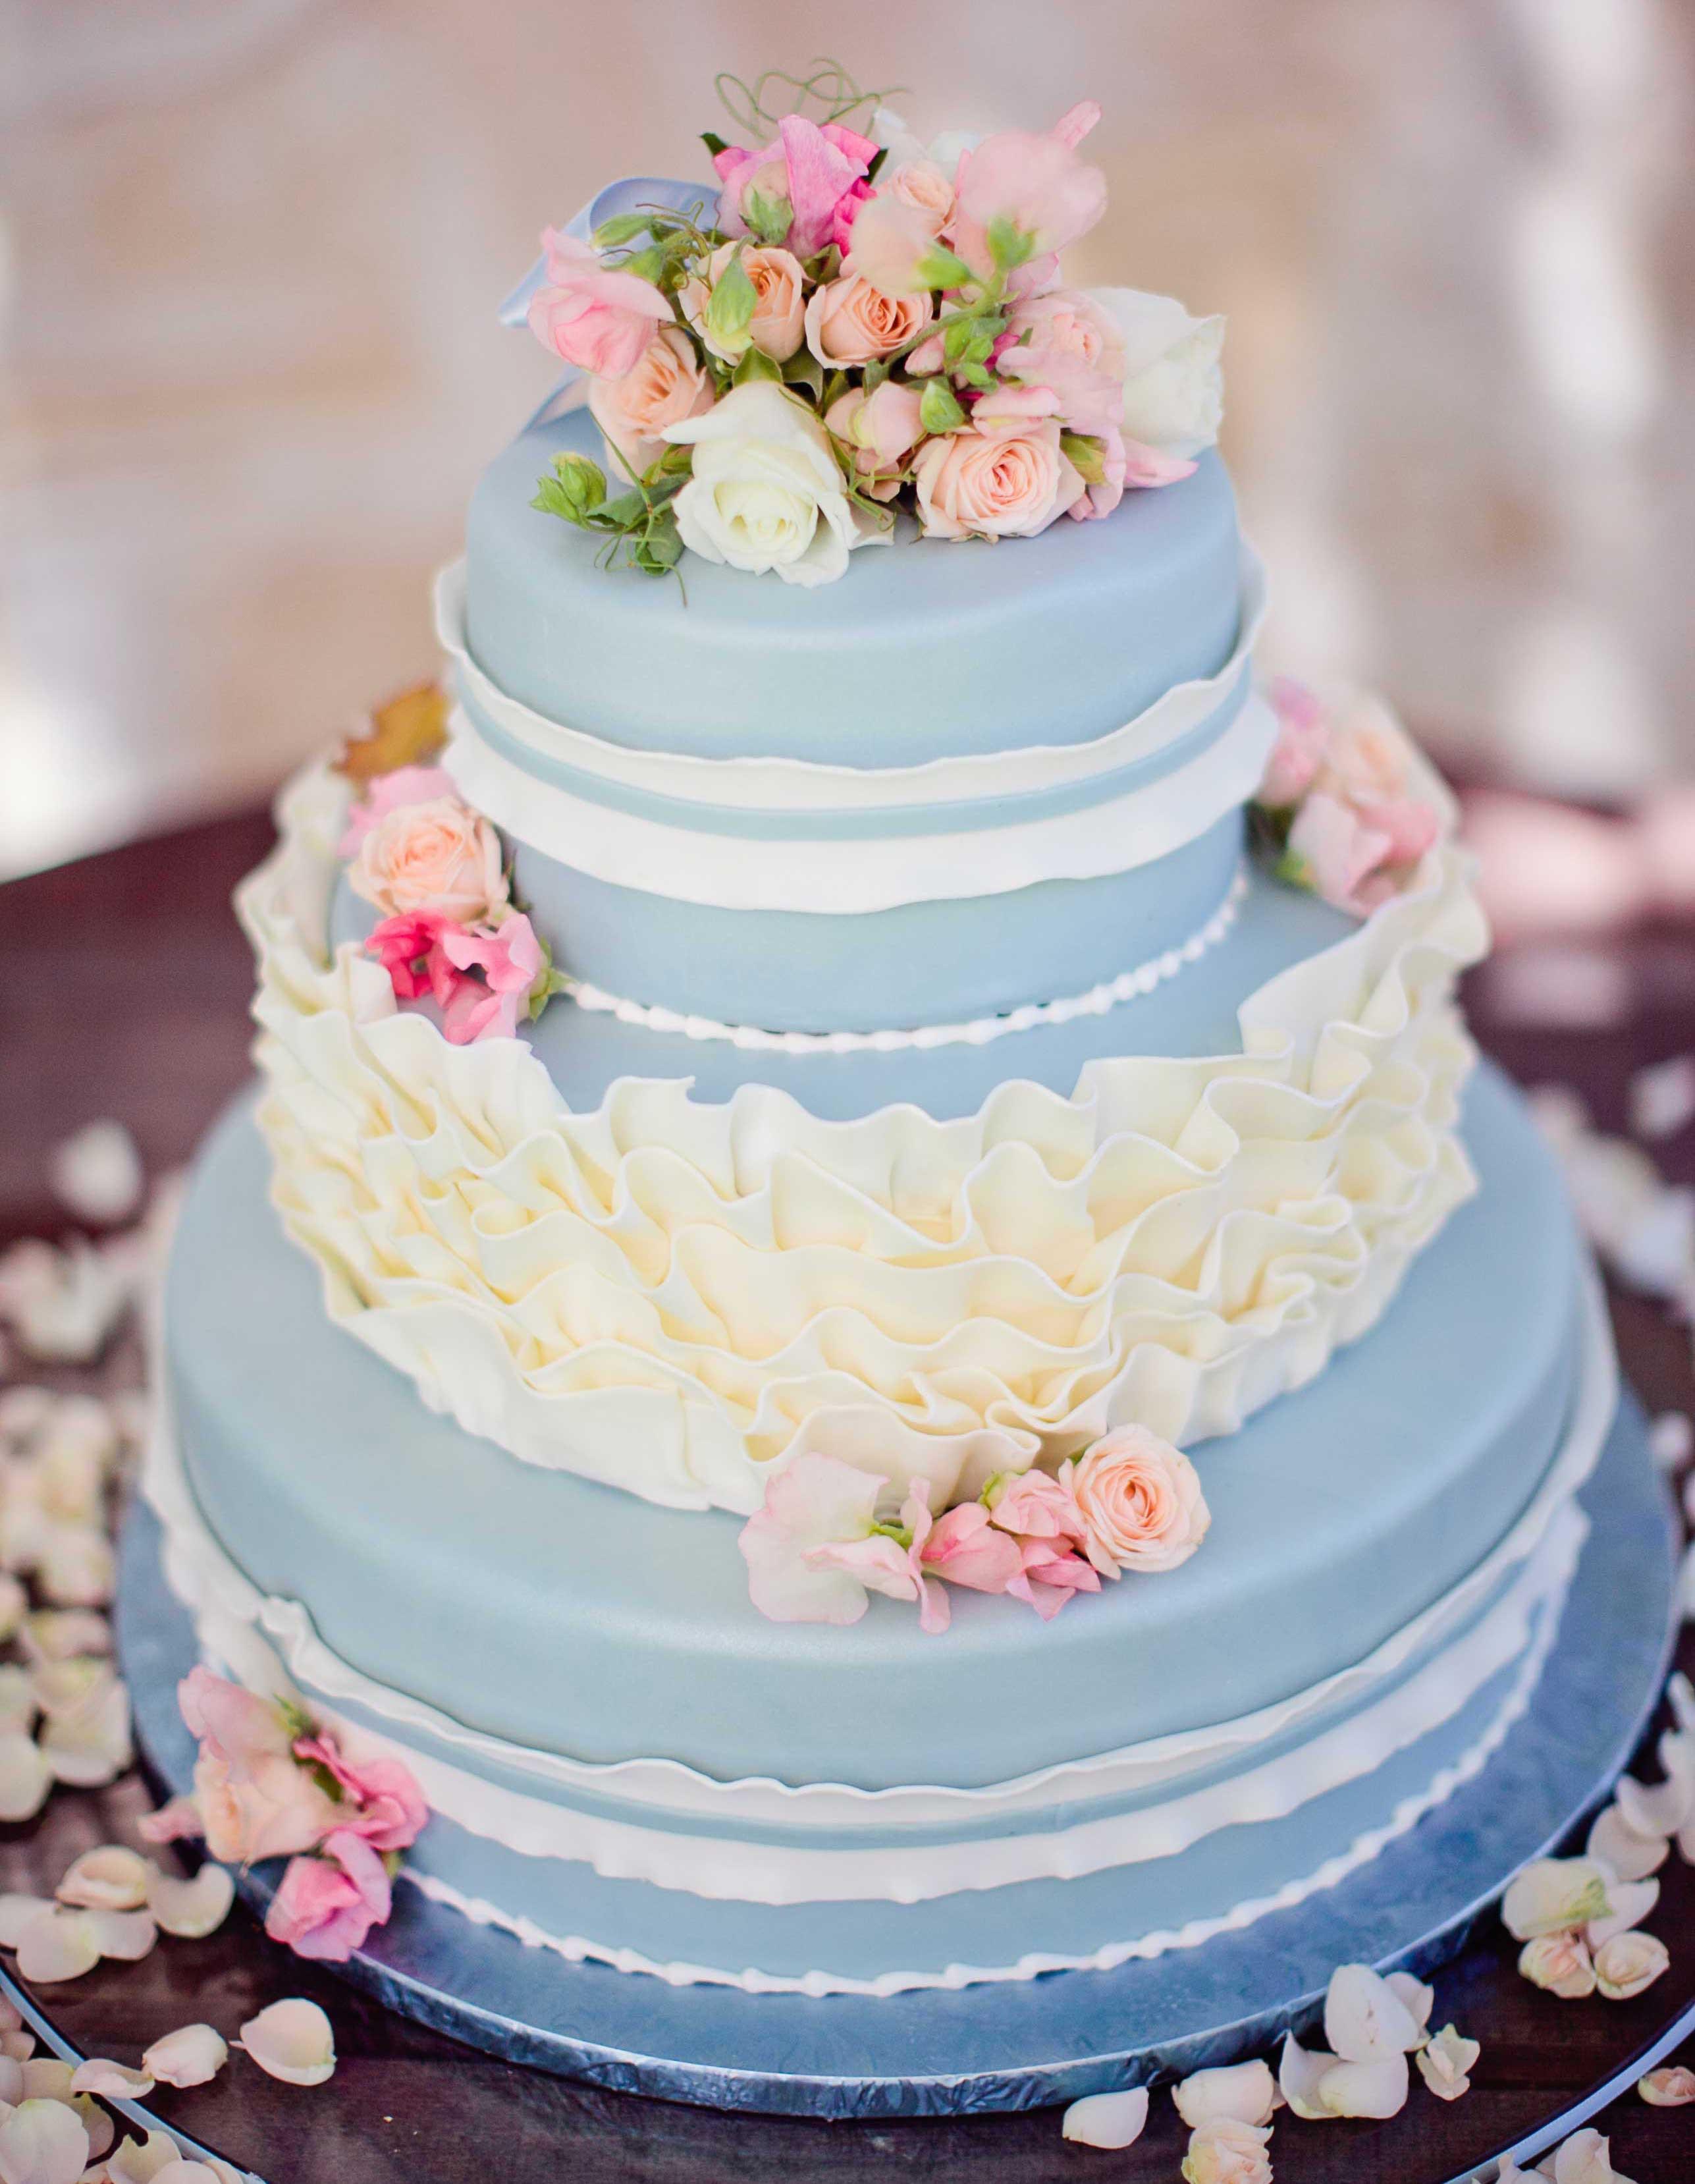 Wedding Cakes Three Tier  Wedding Cake Ideas Small e Two and Three Tier Cakes